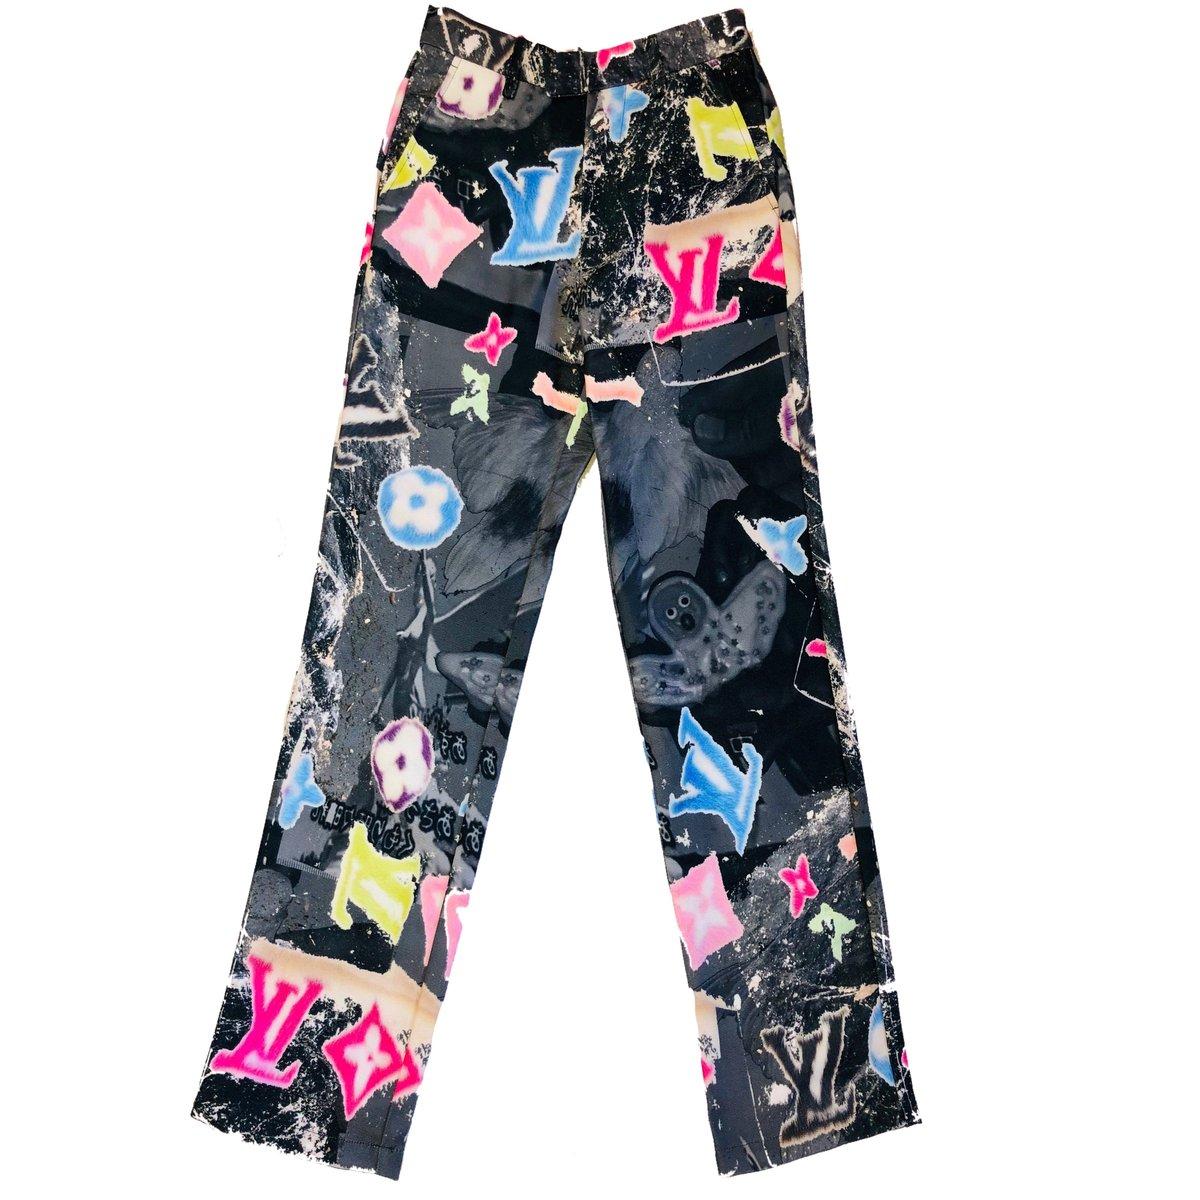 Image of Black Angel Hands Pants